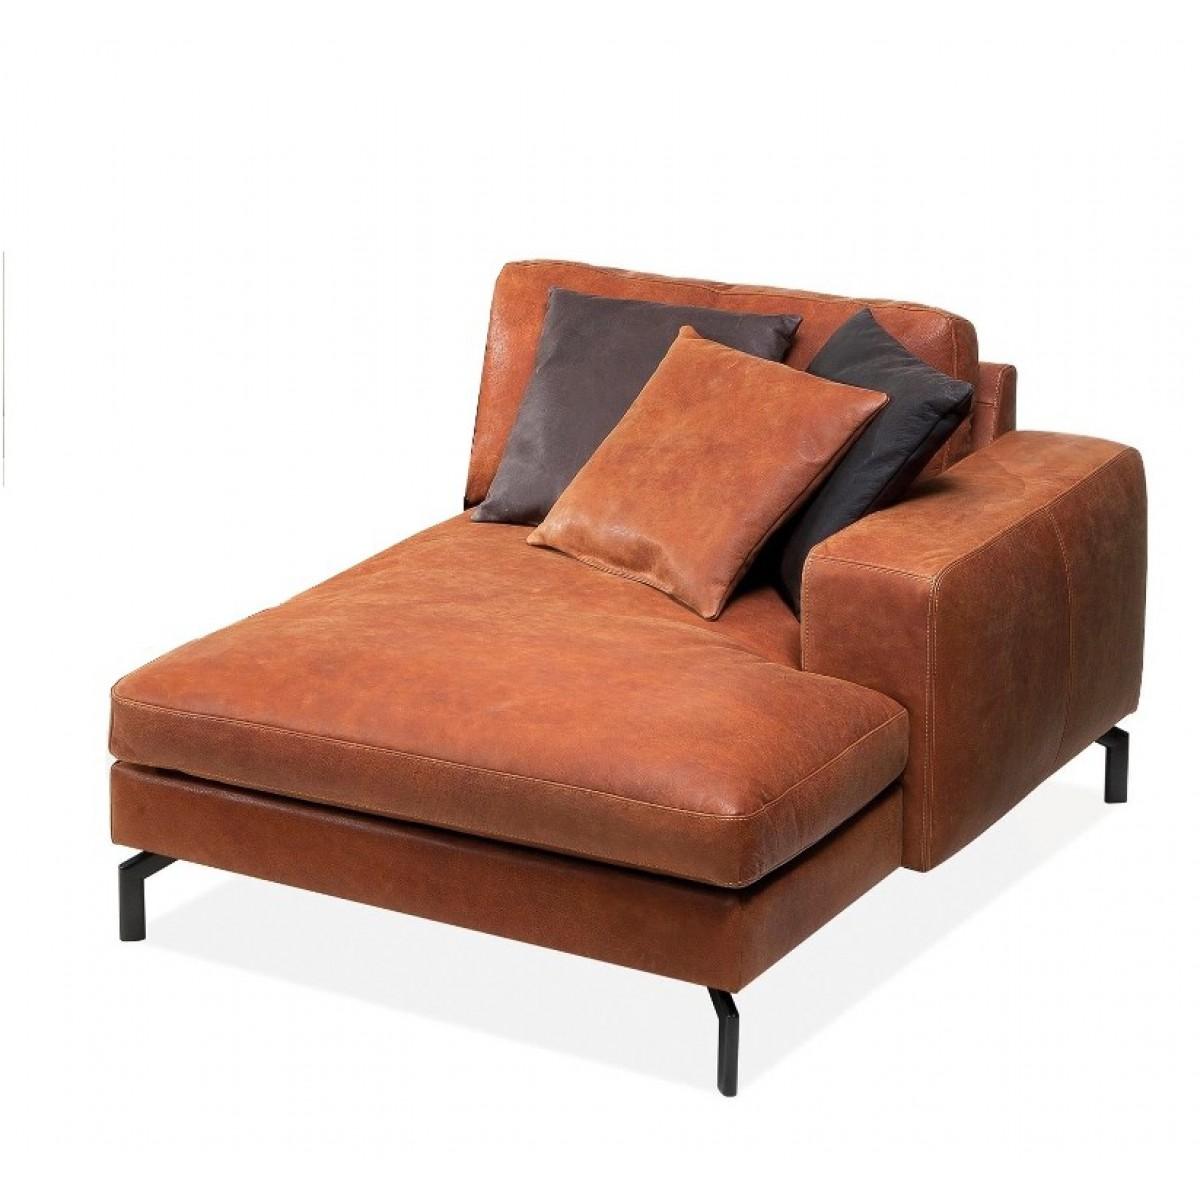 malta-elementen-bank-leer-leder-cowboy-chaise-longe-rechts